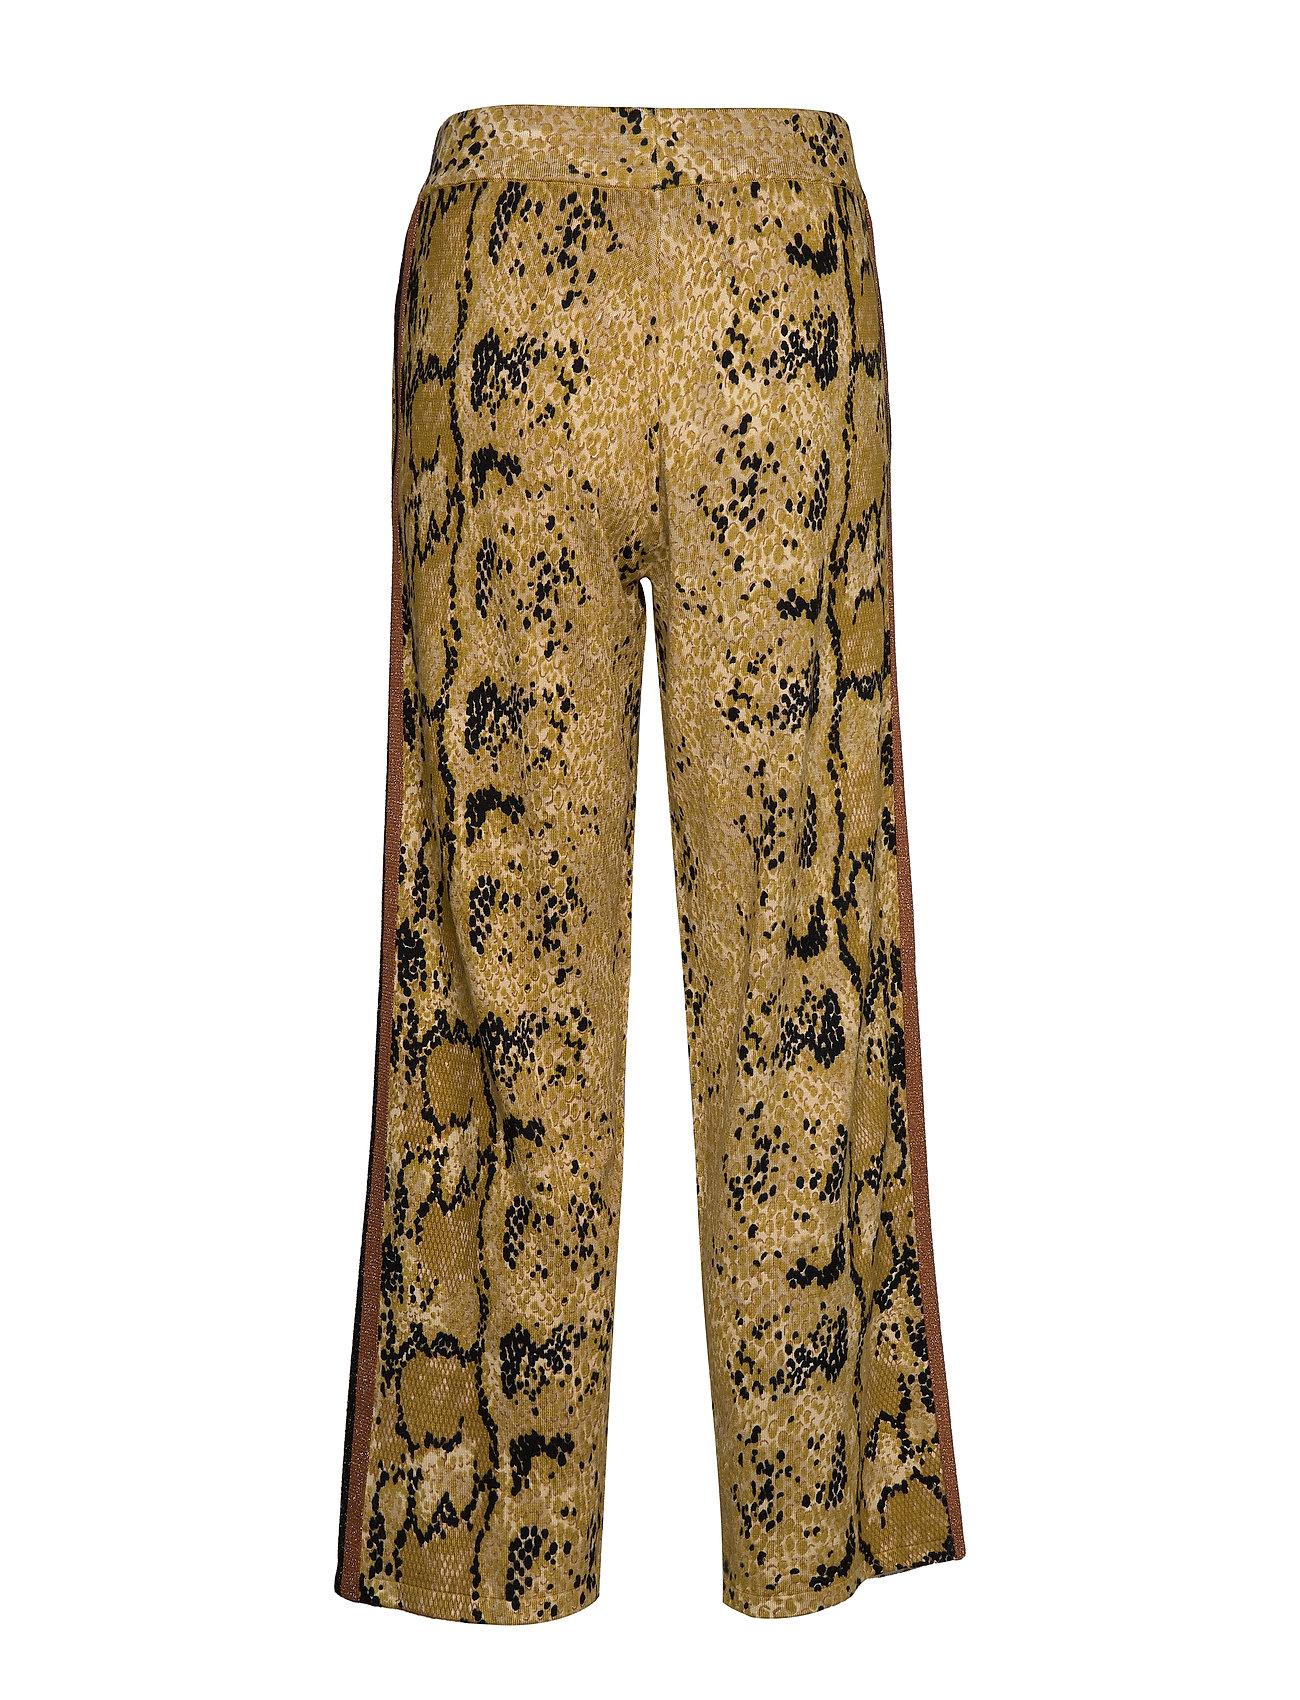 Pants Pyton Printyellow Knitted PytonCoster Copenhagen In doerxCB